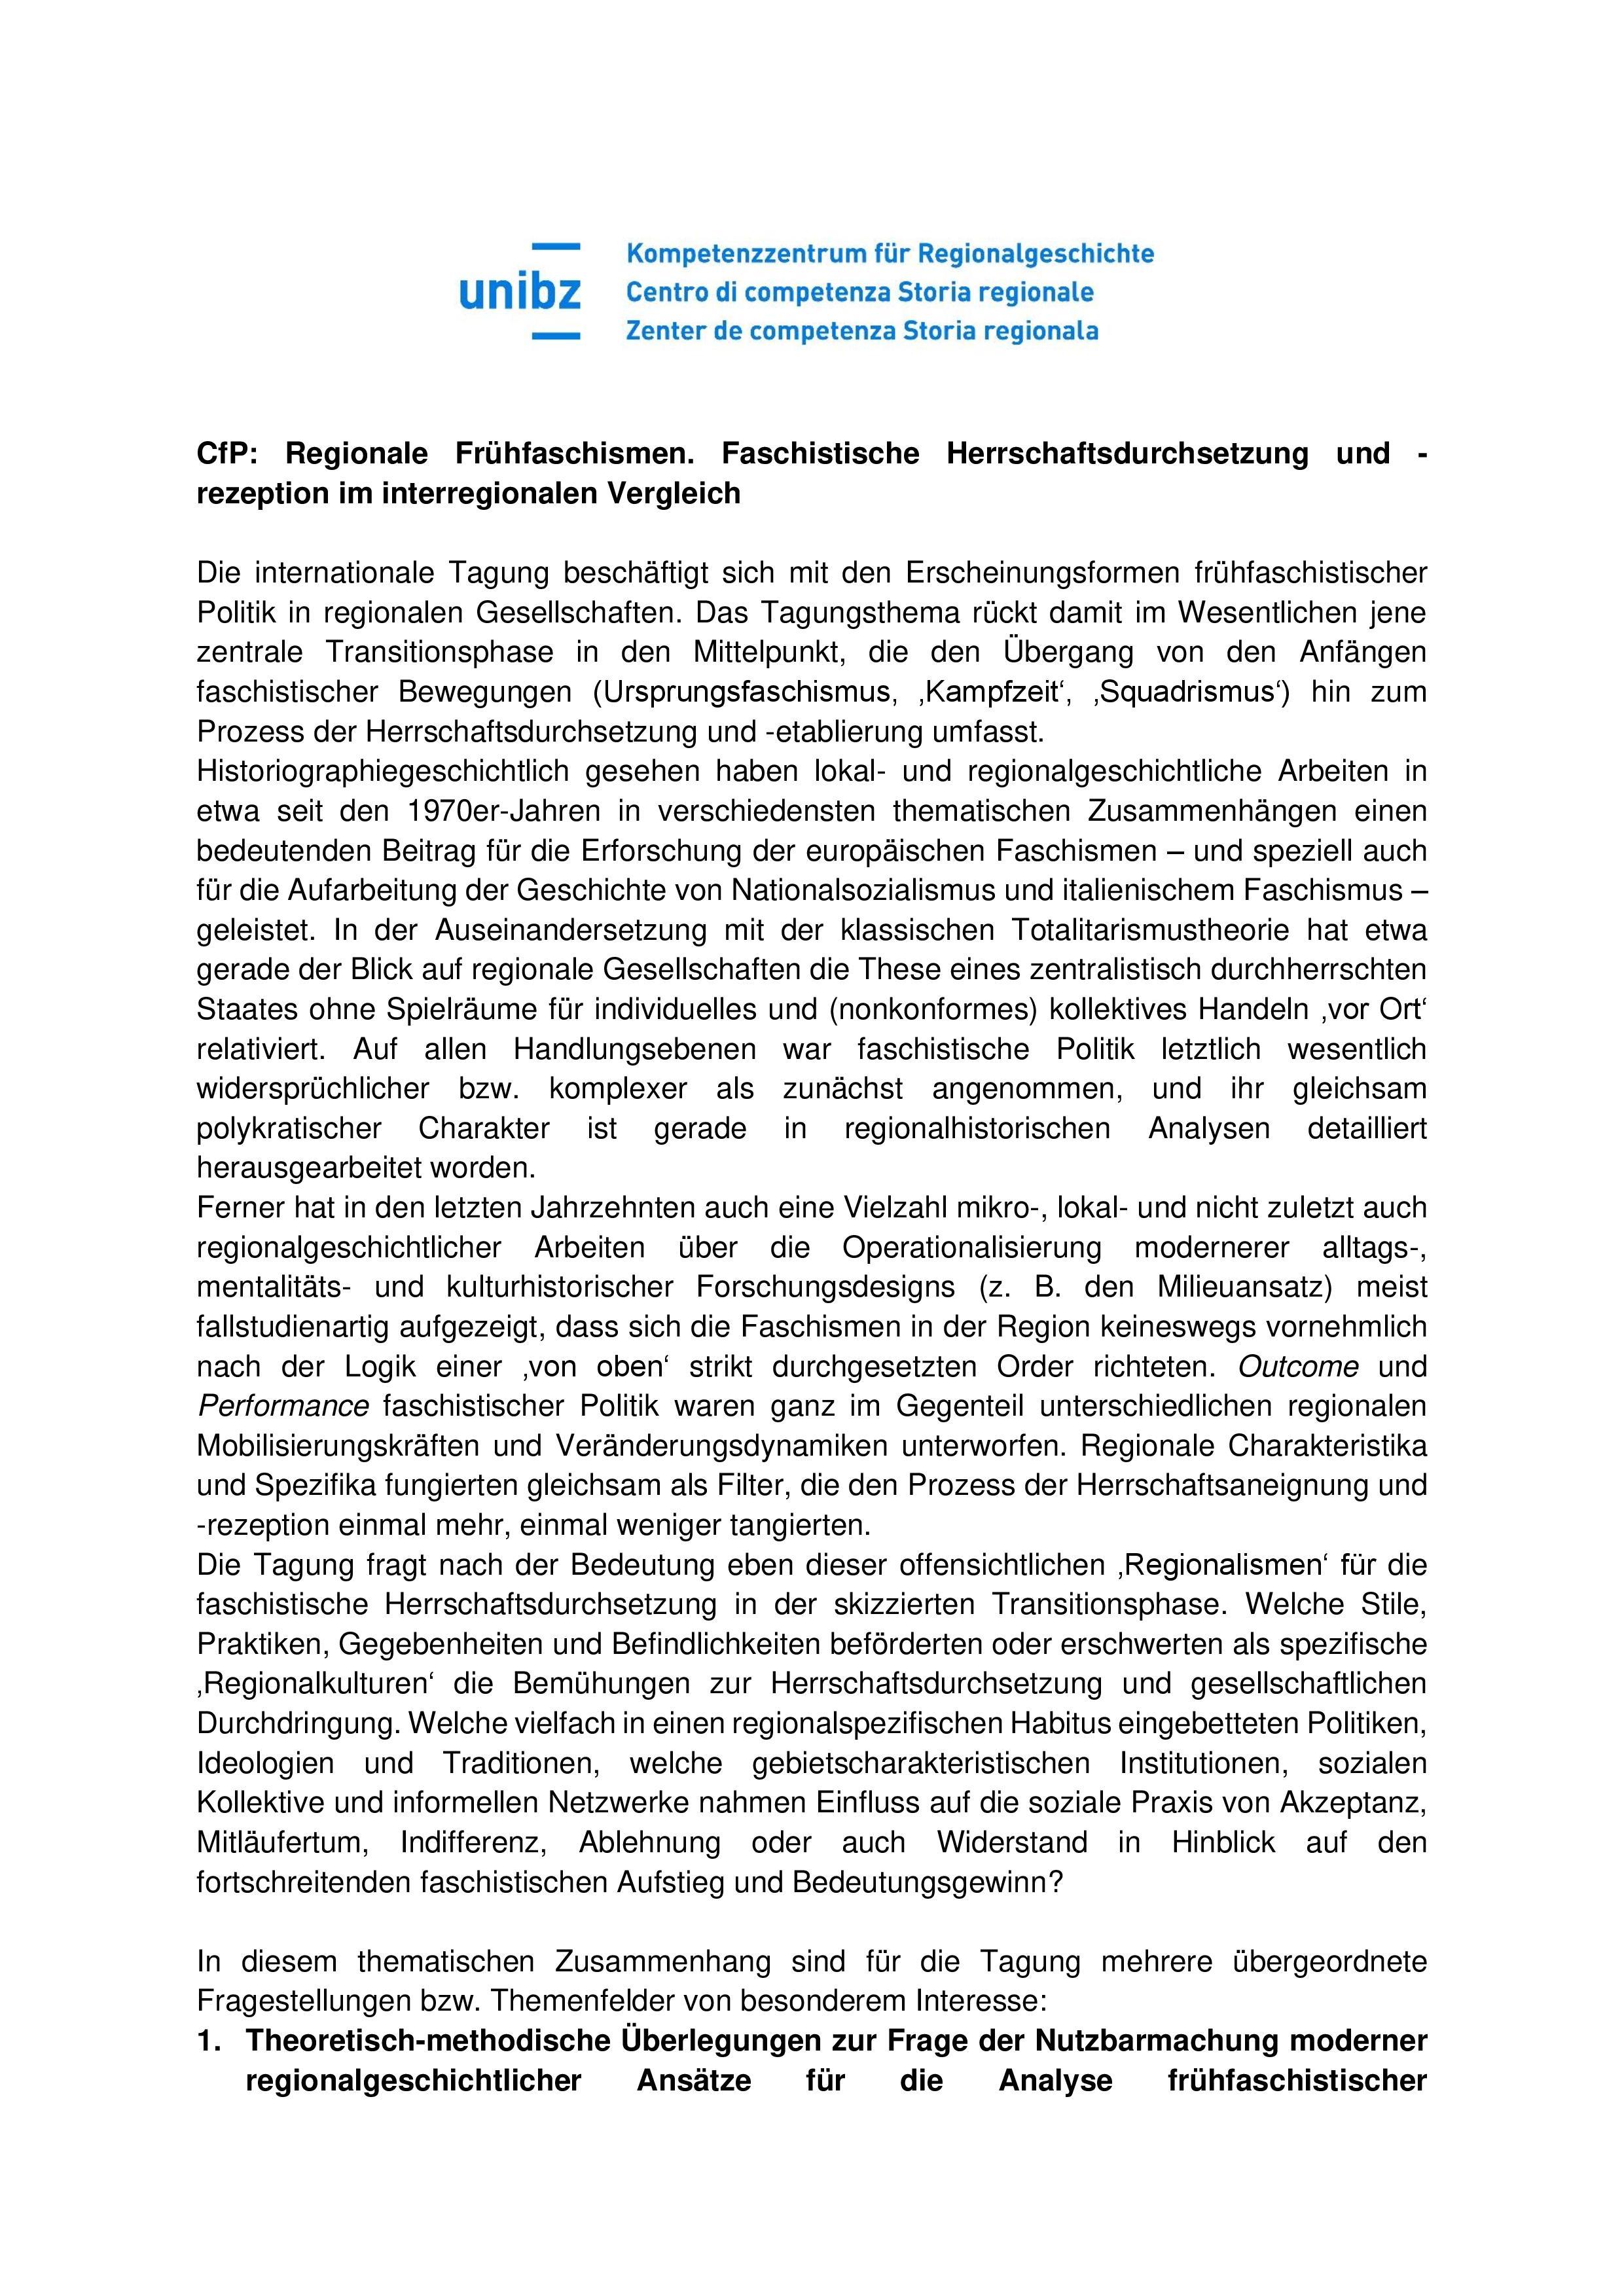 CfP_Fruehfaschismen (1)-page-001